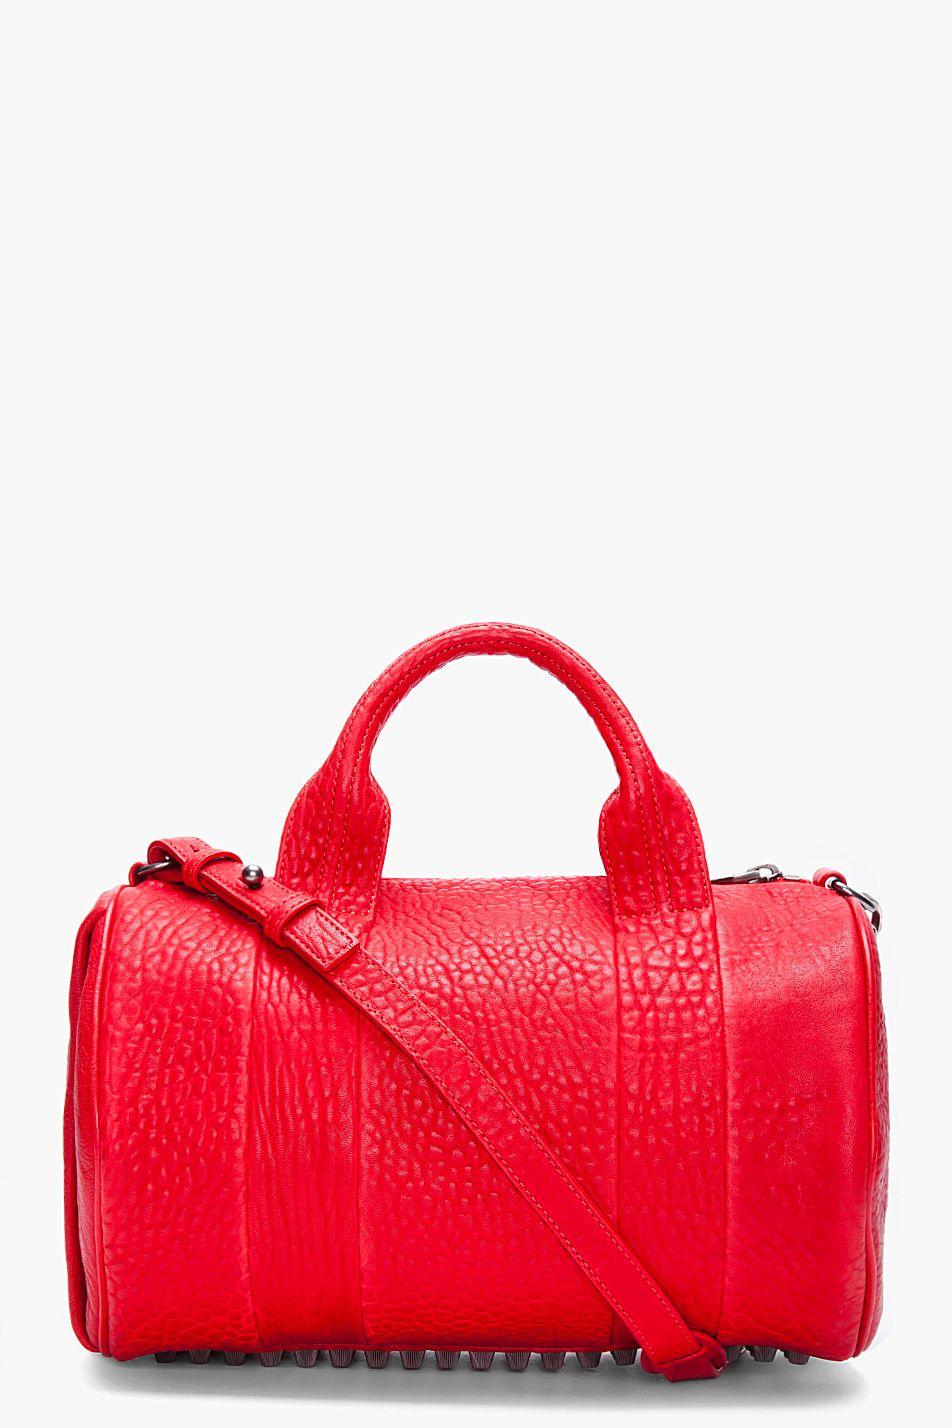 5ca255b3eca38 Alexander Wang Red Rococo Mini Duffle Bag   Bags! Bags! Bags ...